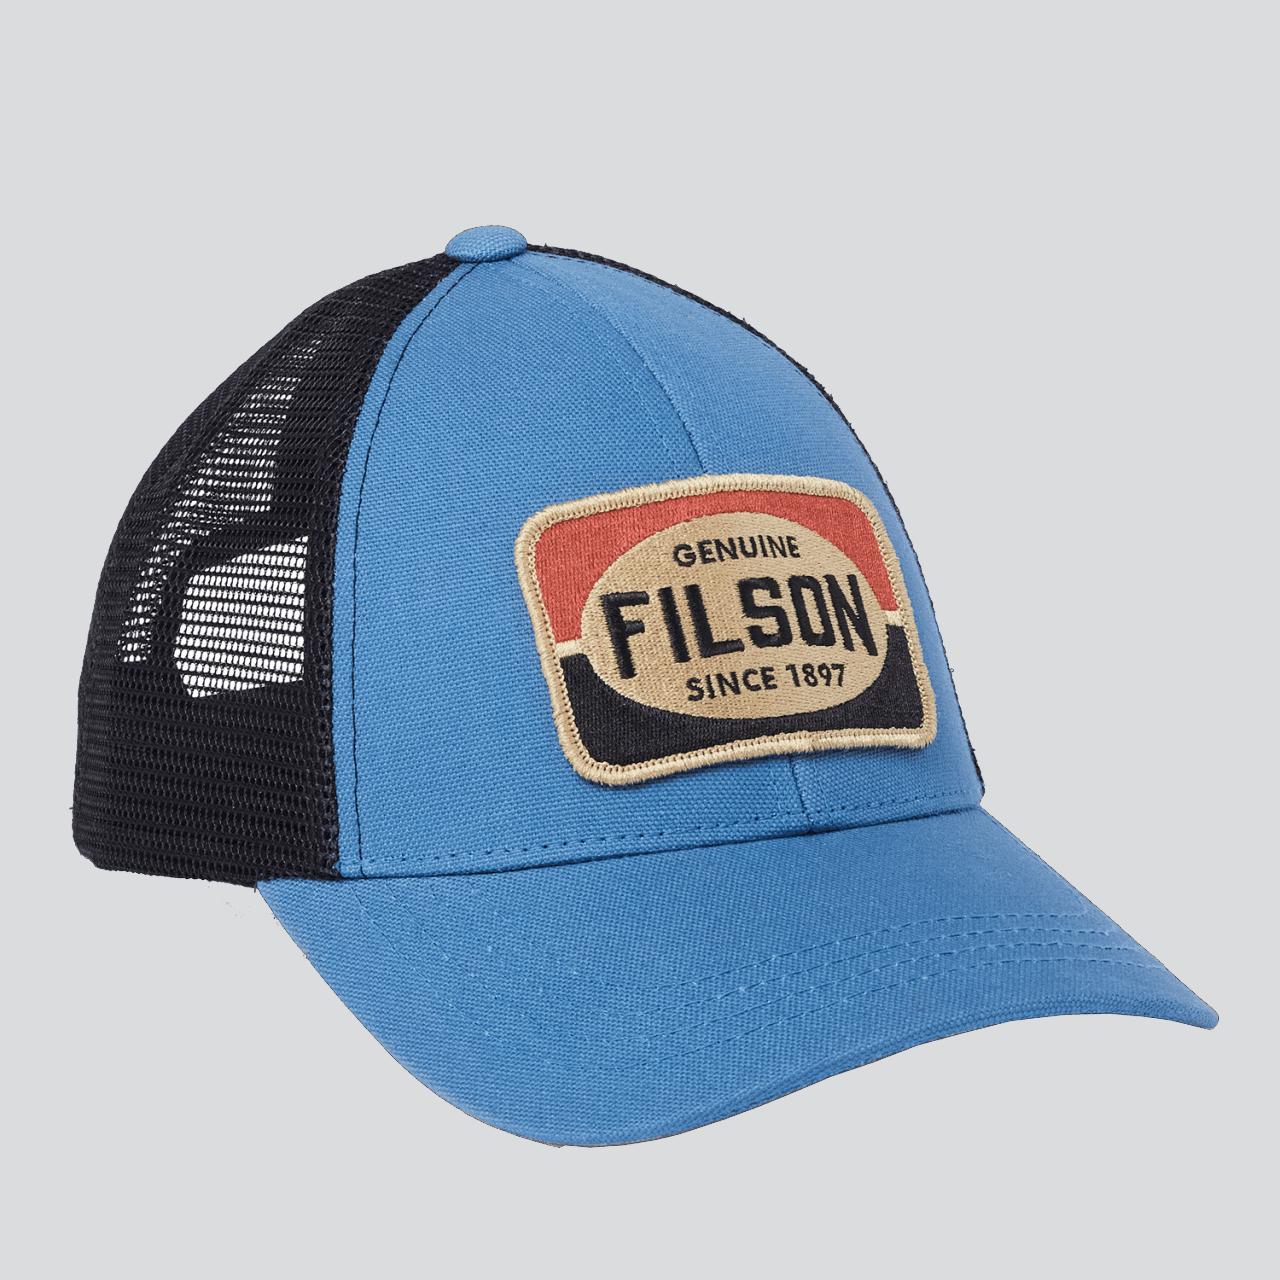 Filson Mesh Snap Logger Cap - Blue